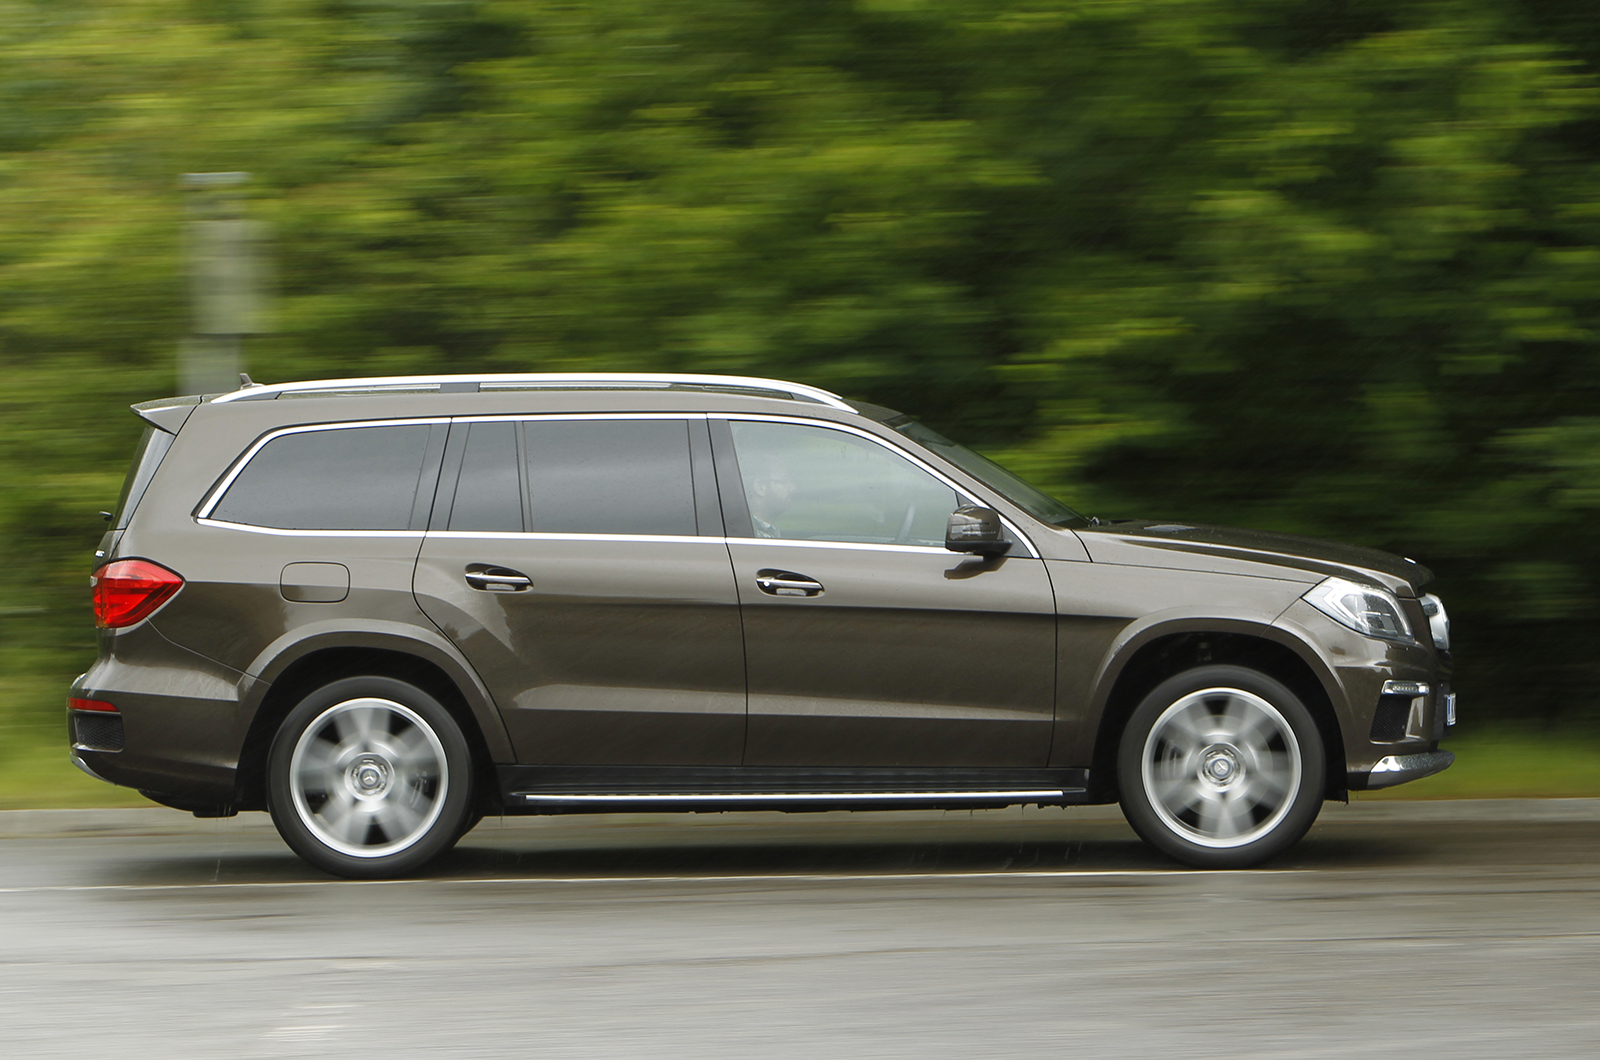 Mercedes benz gl class review autocar for Mercedes benz gl reviews